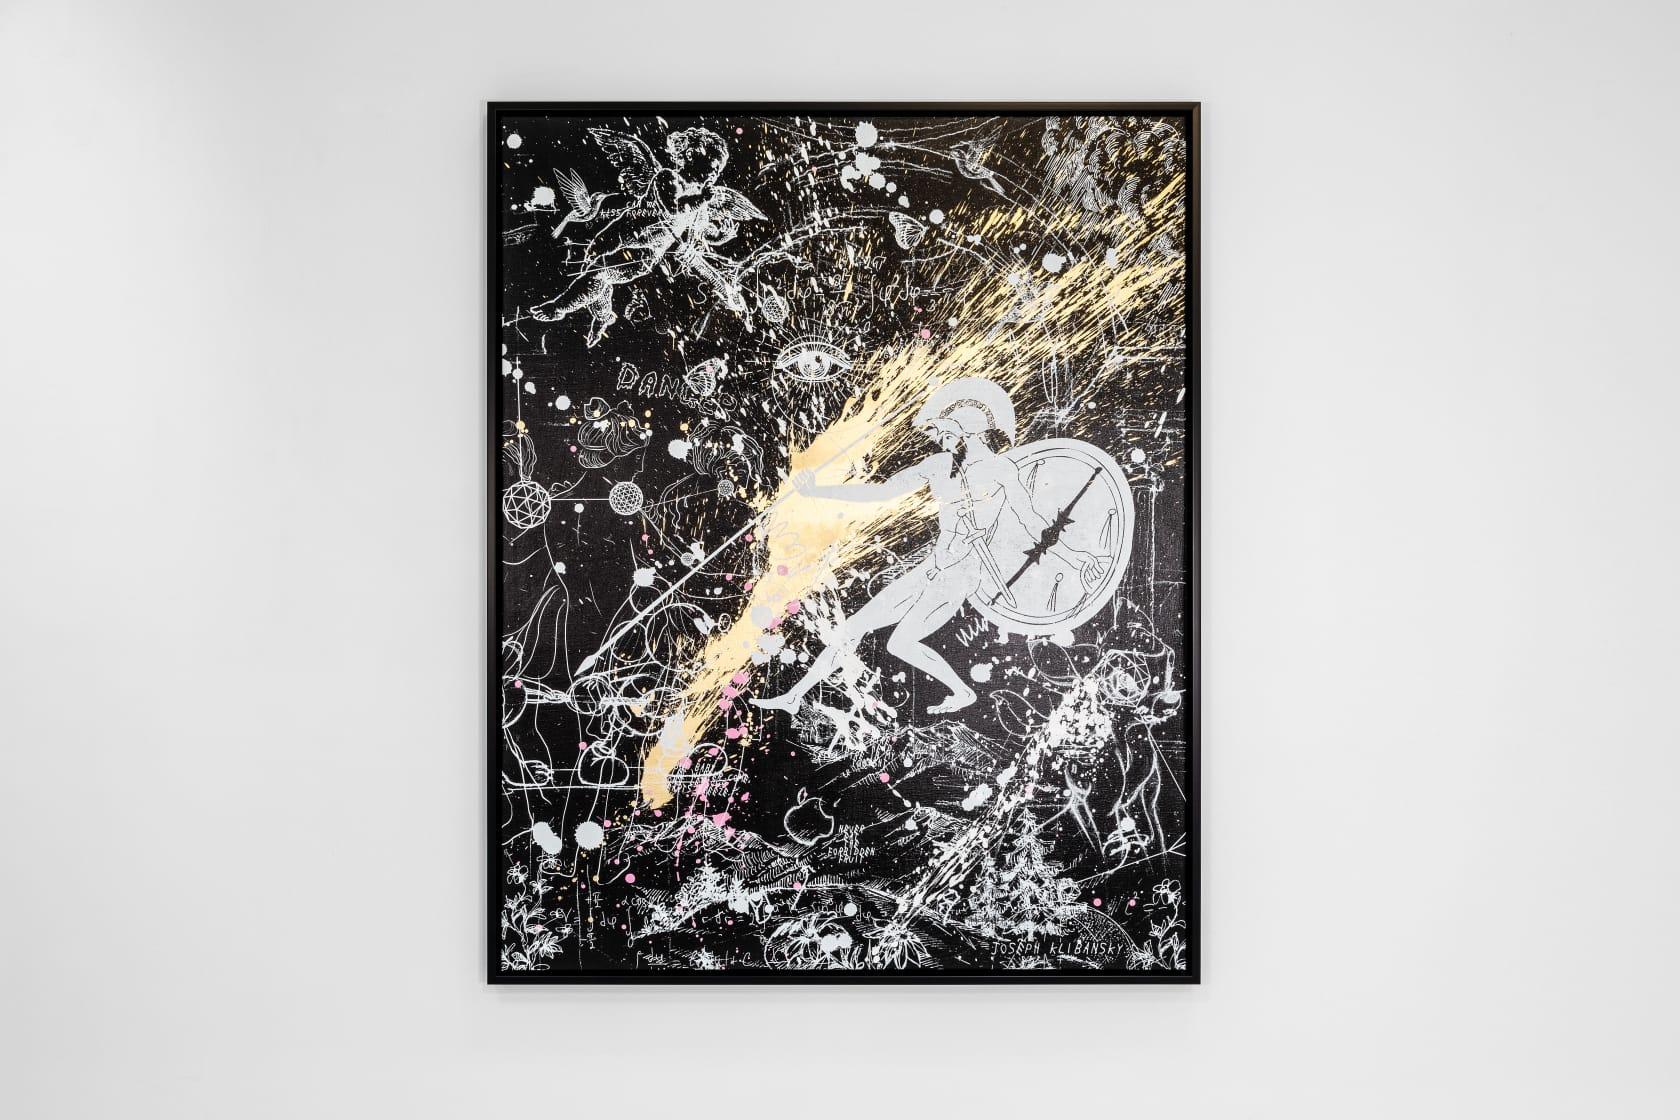 Joseph Klibansky, Into My Heart (Black/White, Gold, Pink and White Splash), 2021